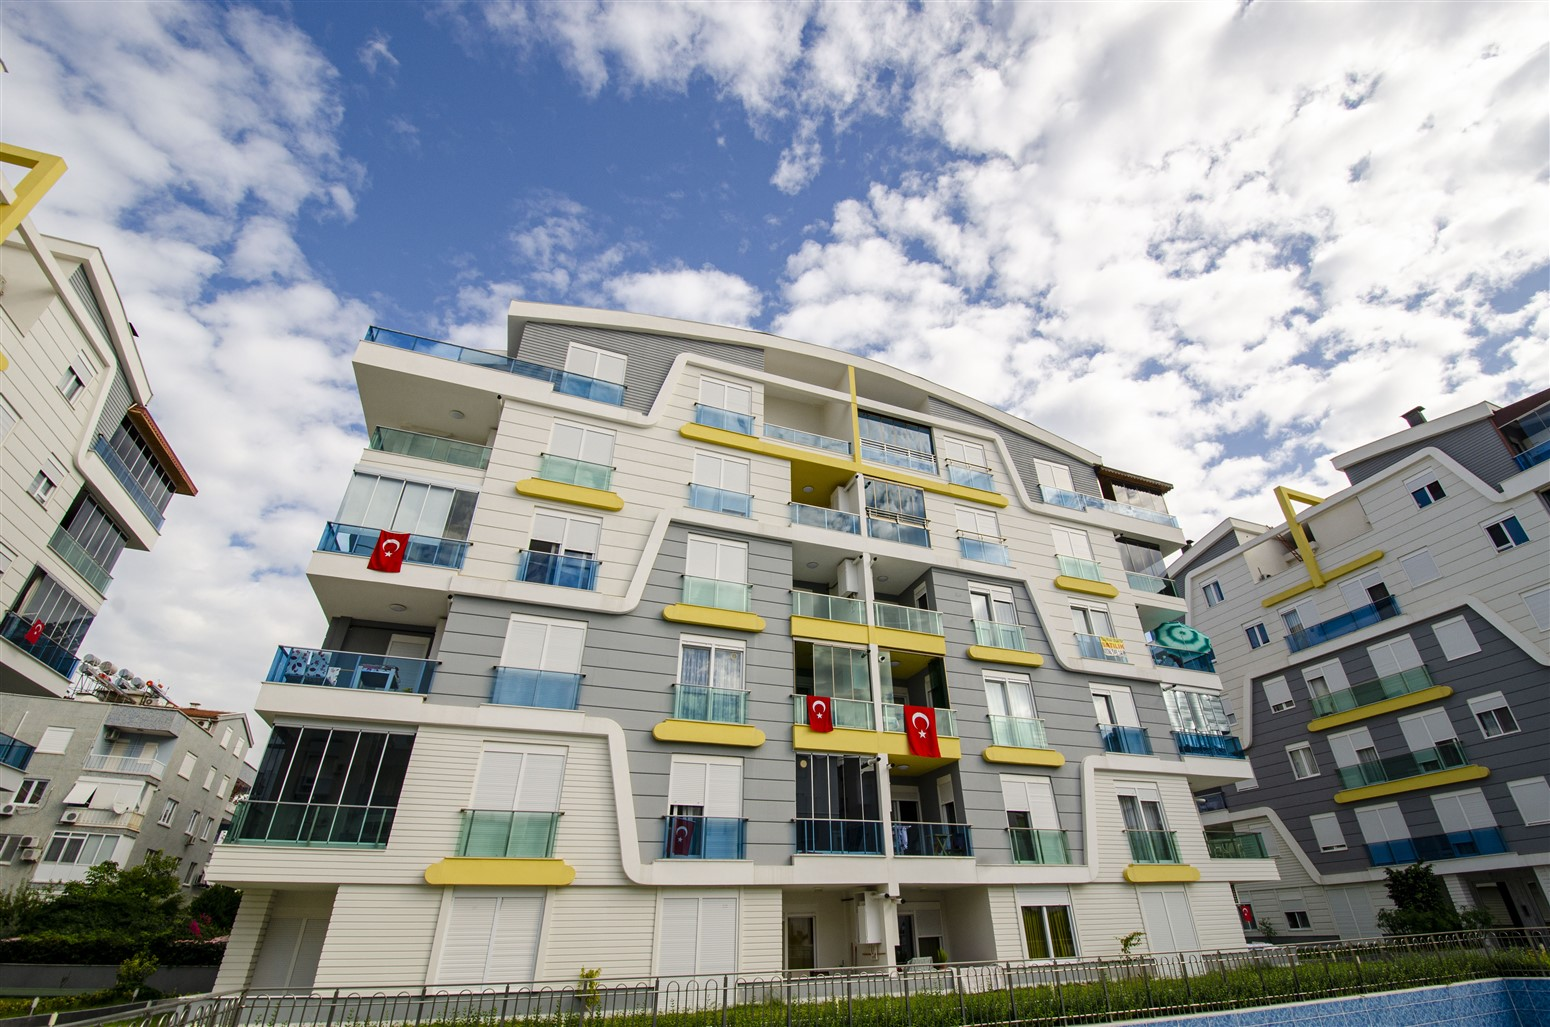 Трёхкомнатная квартира в микрорайоне Лиман - Фото 8